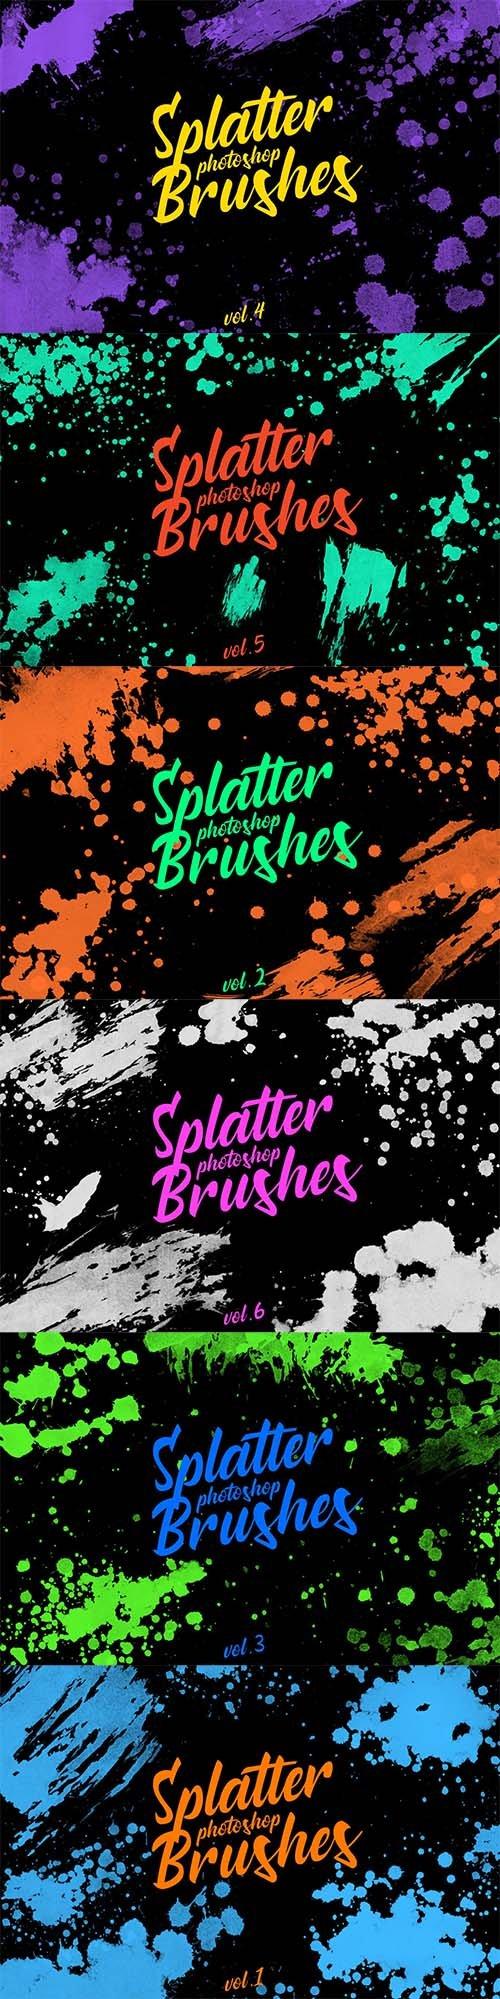 Splatter Stamp Photoshop Brushes Vol. 1-6